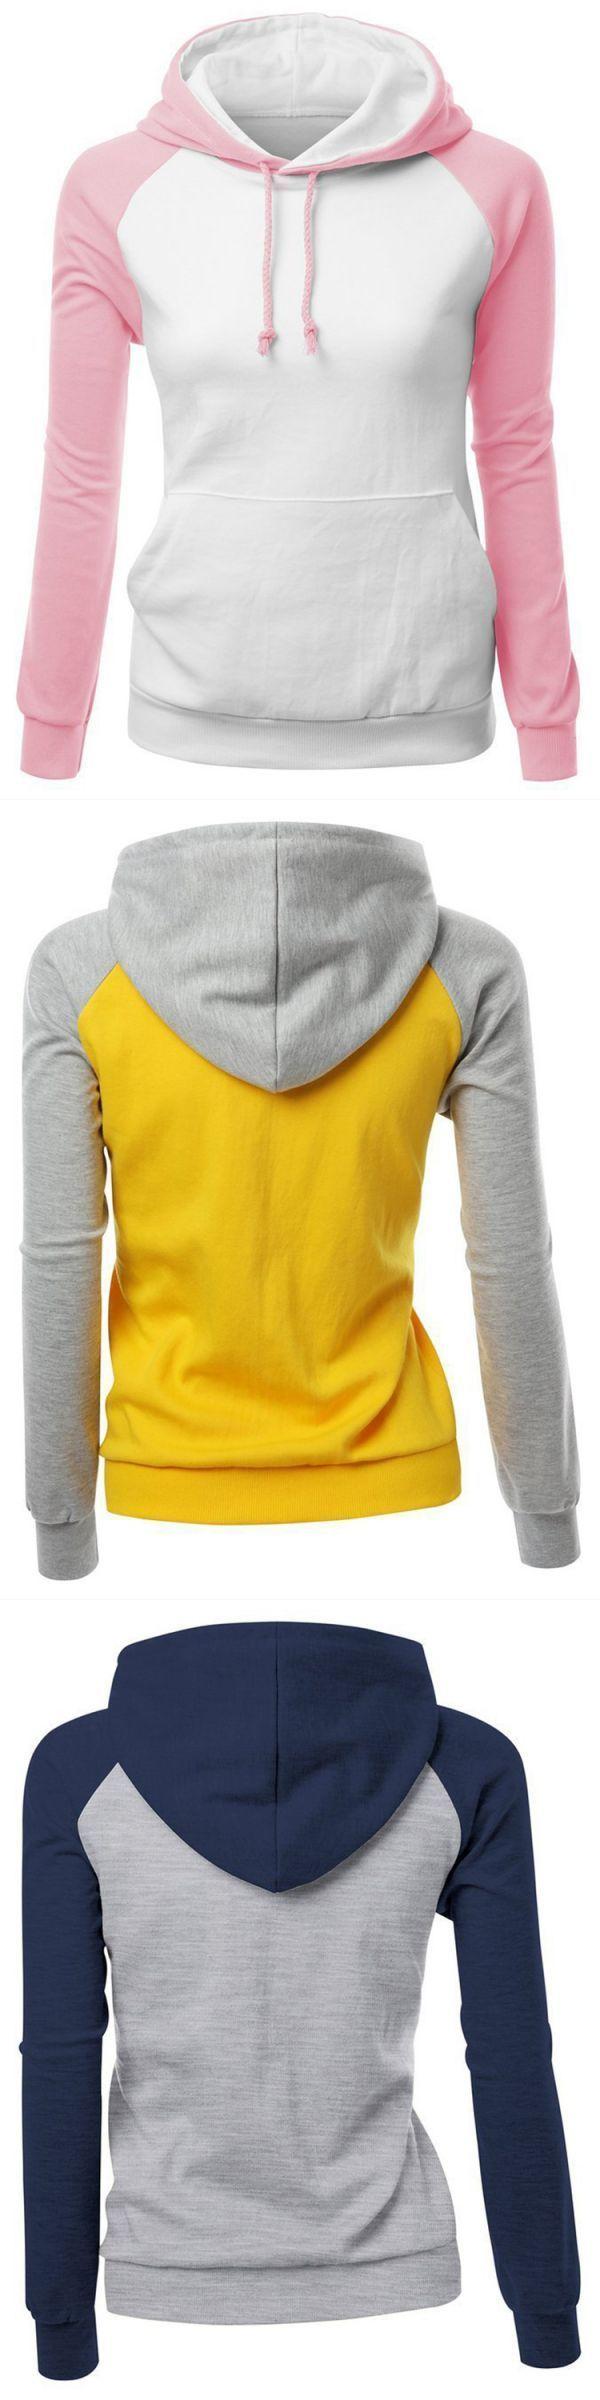 Sweatshirts with words casual patchwork long sleeve hooded loose women sweatshirt #ohio #u #sweatshirts #sweatshirts #greece #sweatshirts #meaning #sweatshirts #vs #sweater